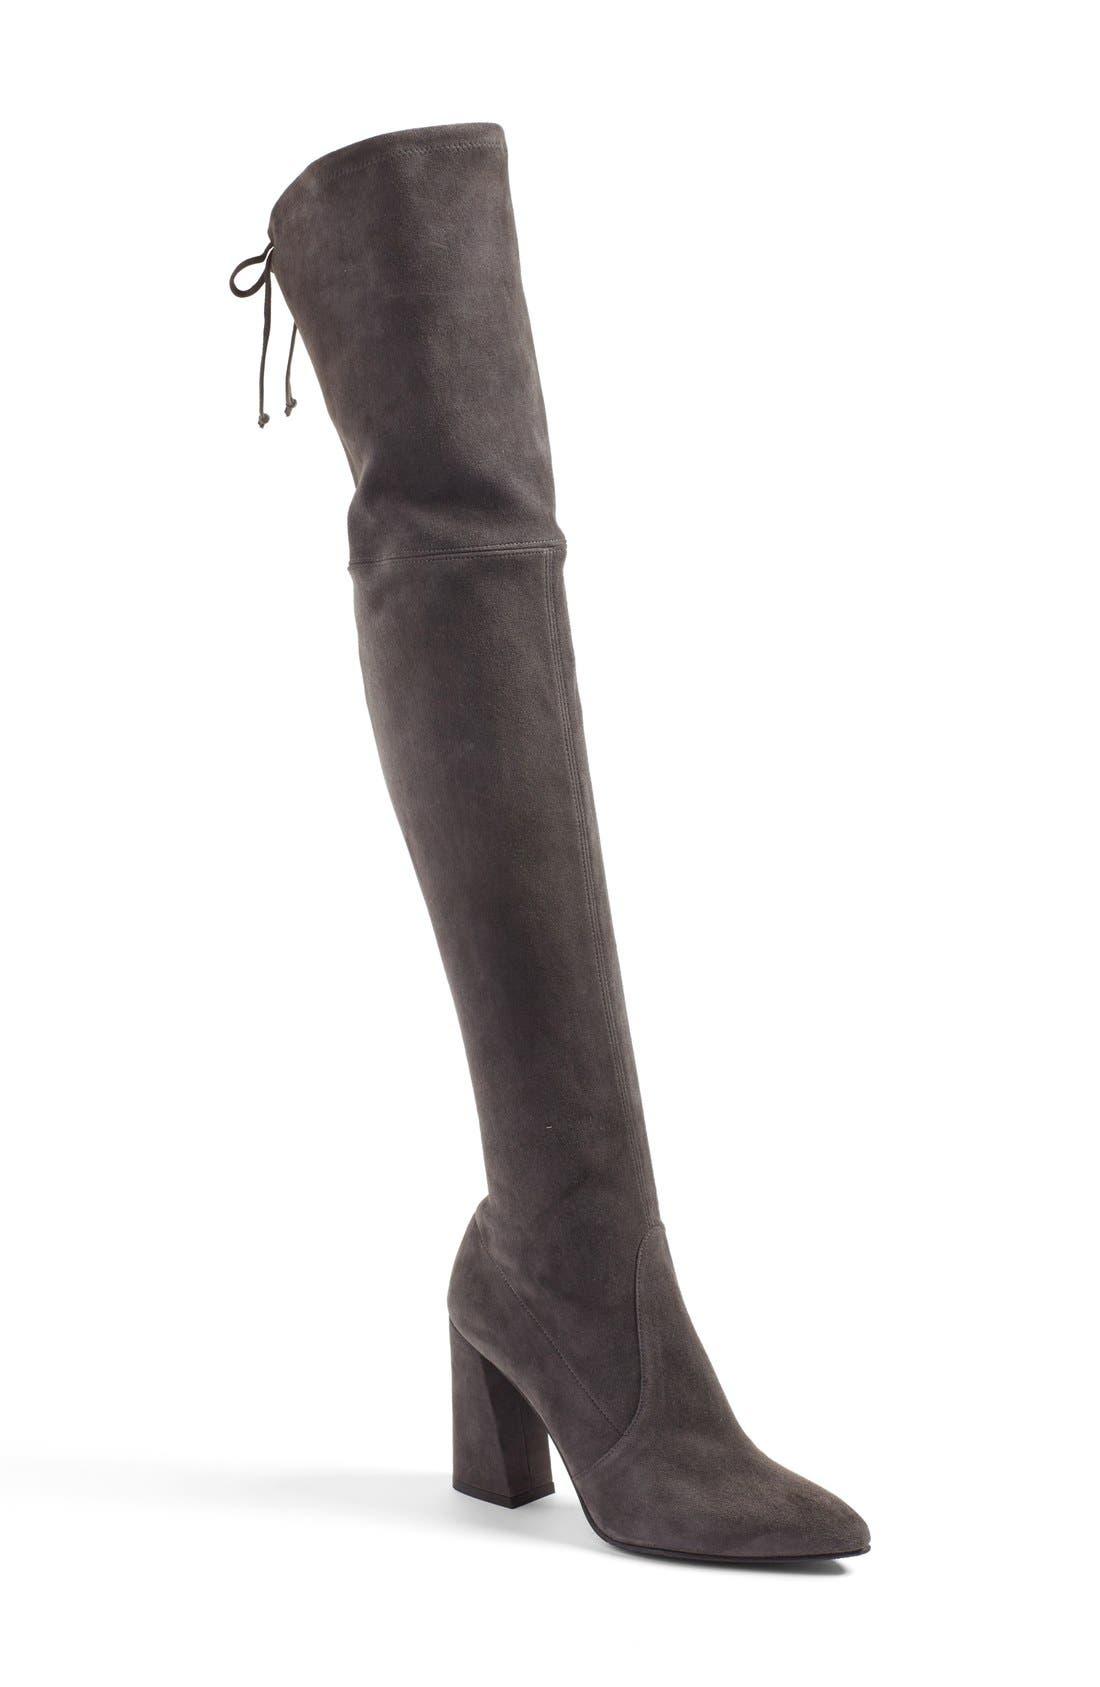 Alternate Image 1 Selected - Stuart Weitzman Highstreet Over The Knee Boot (Women)